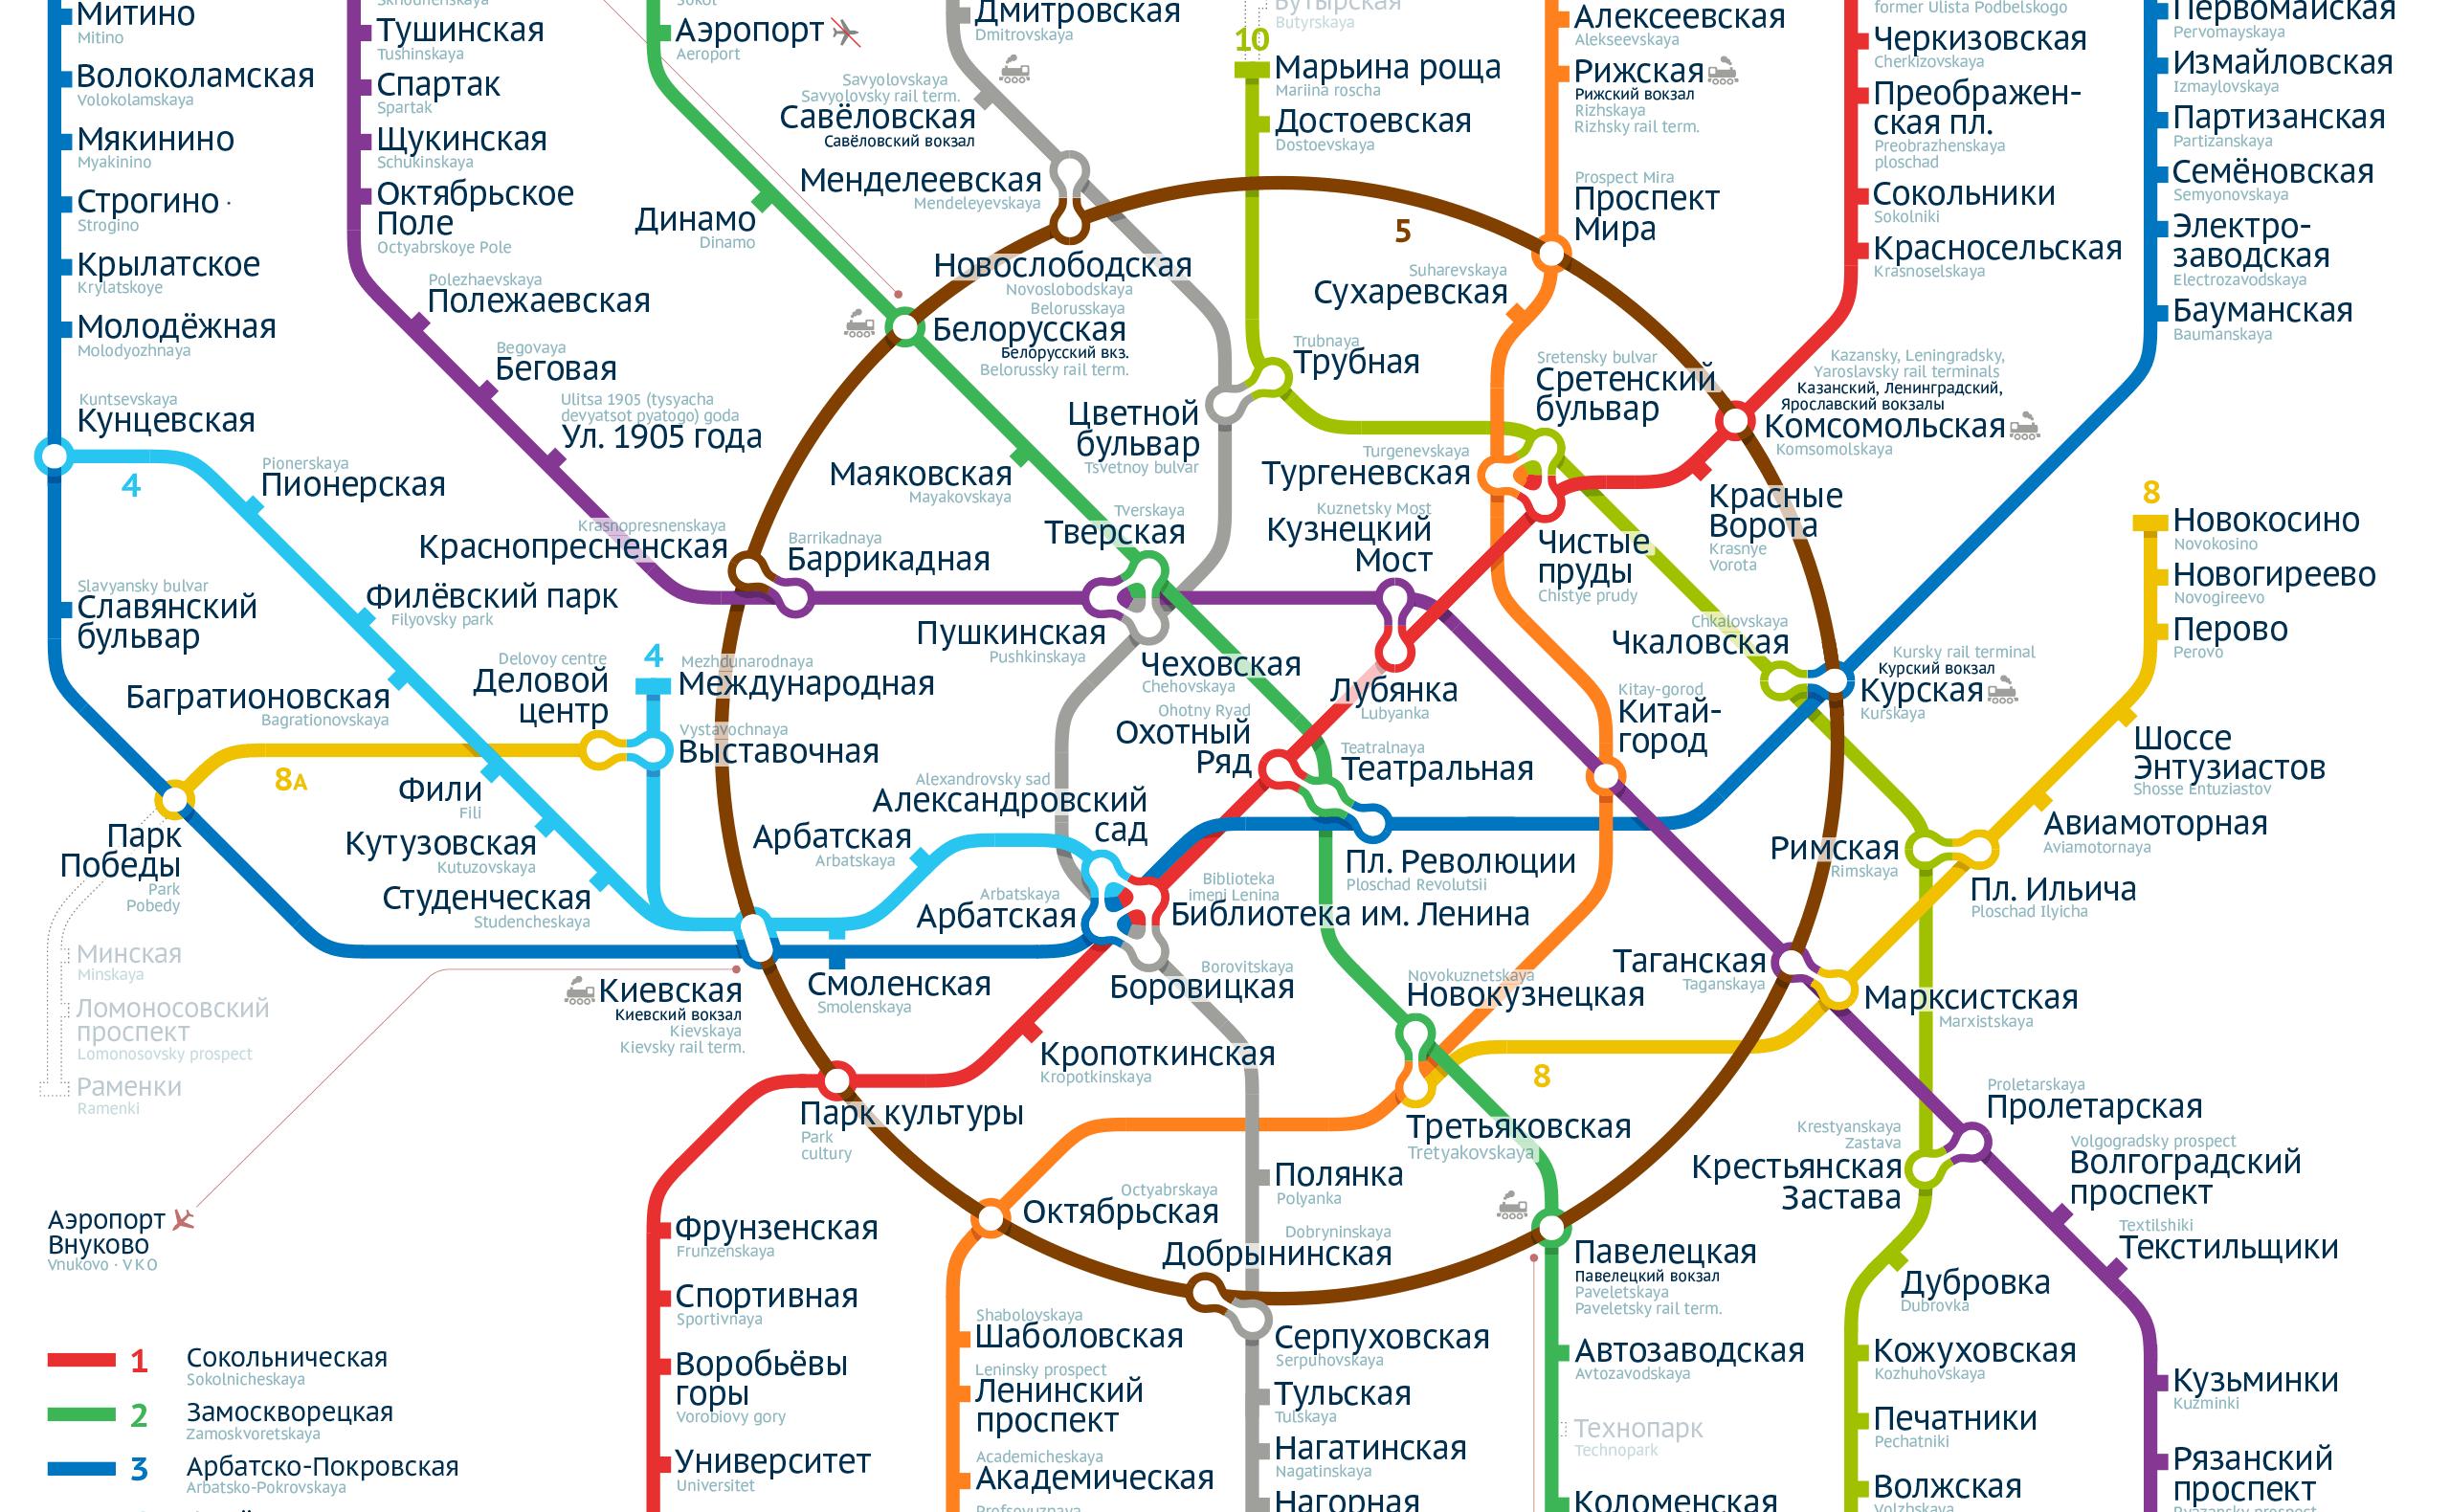 Картинки ниндзя, картинки схемы метро